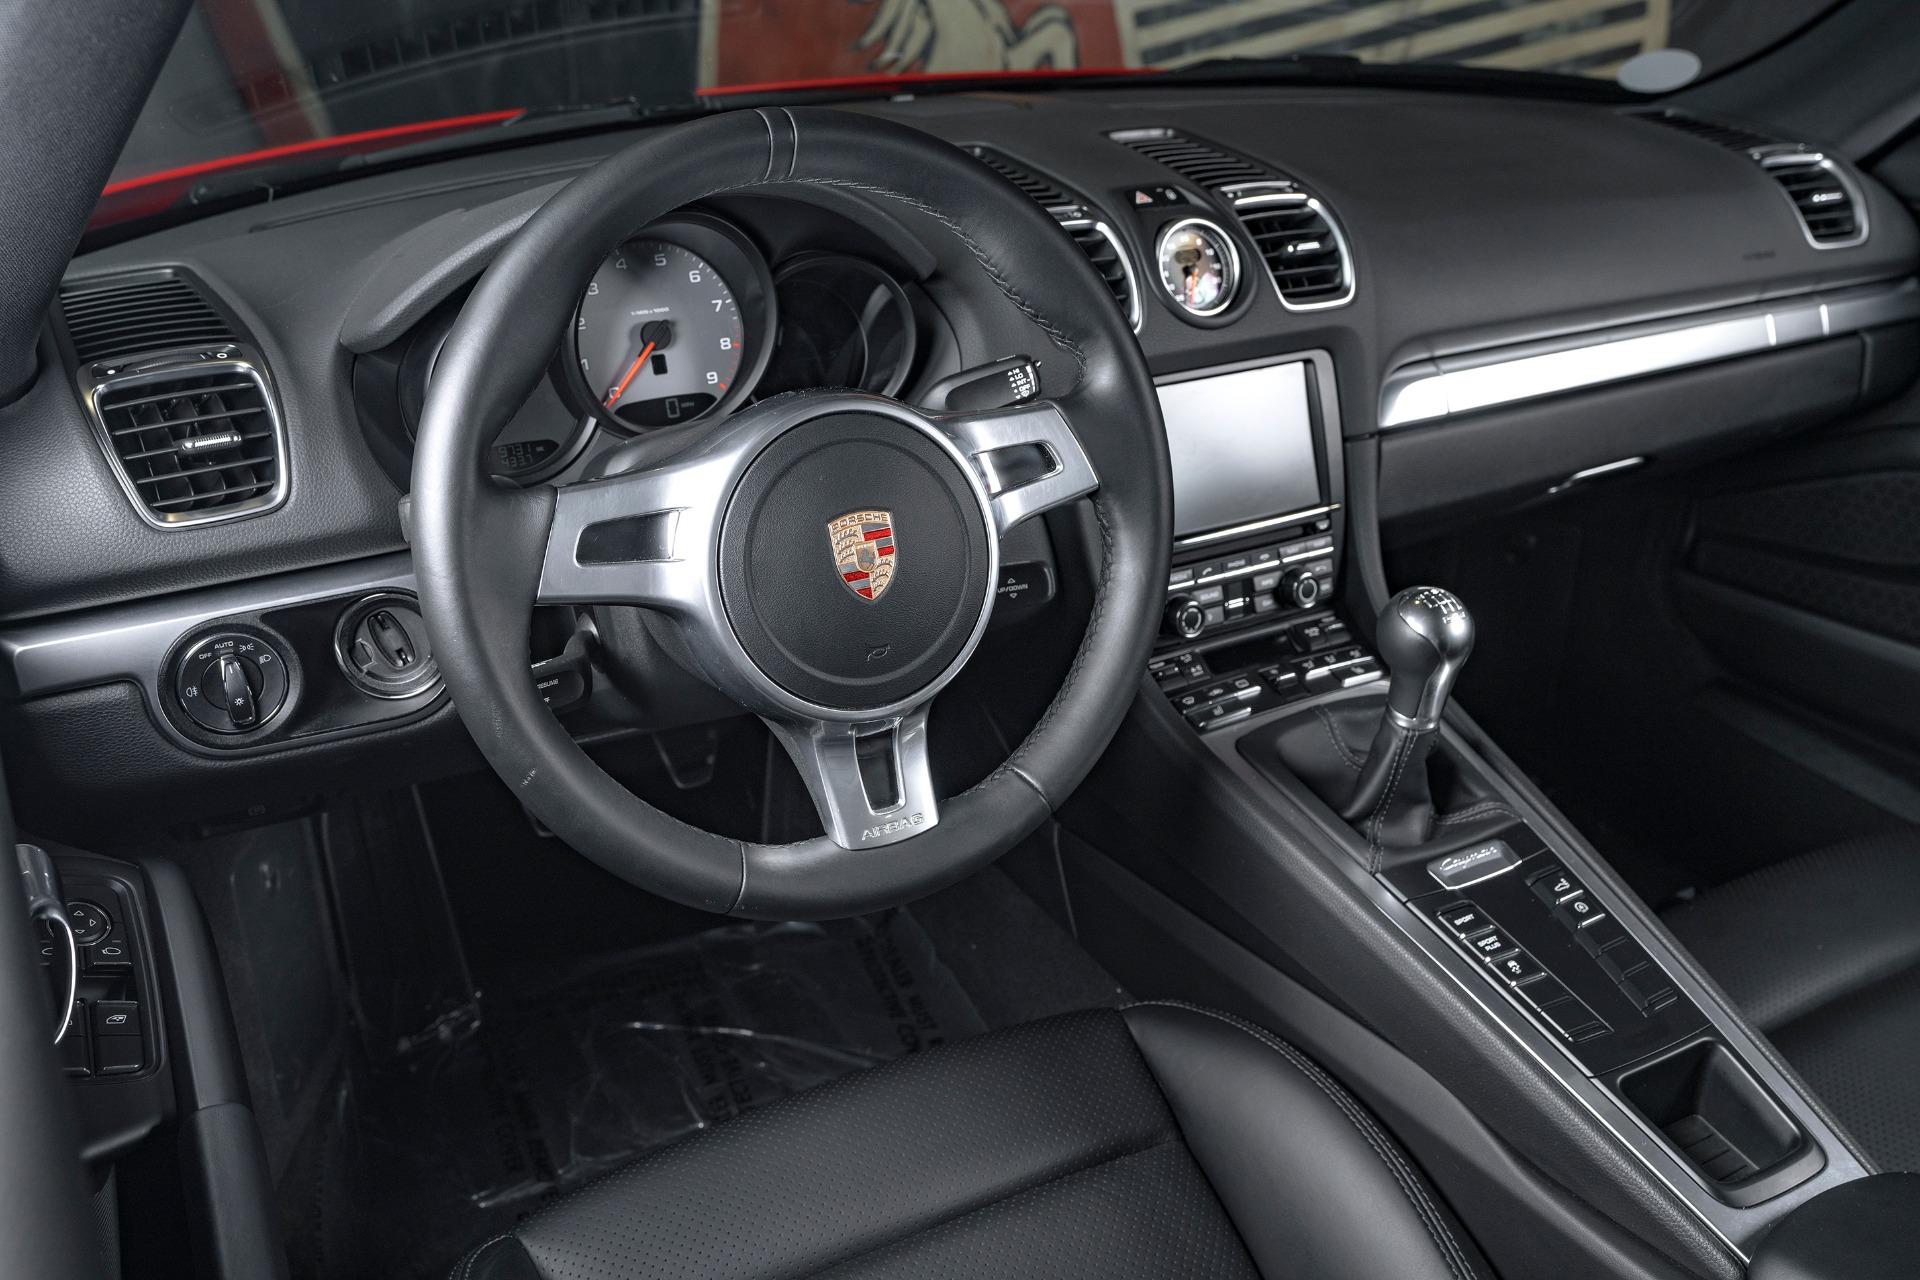 2015 Porsche Cayman S Stock 1495 For Sale Near Oyster